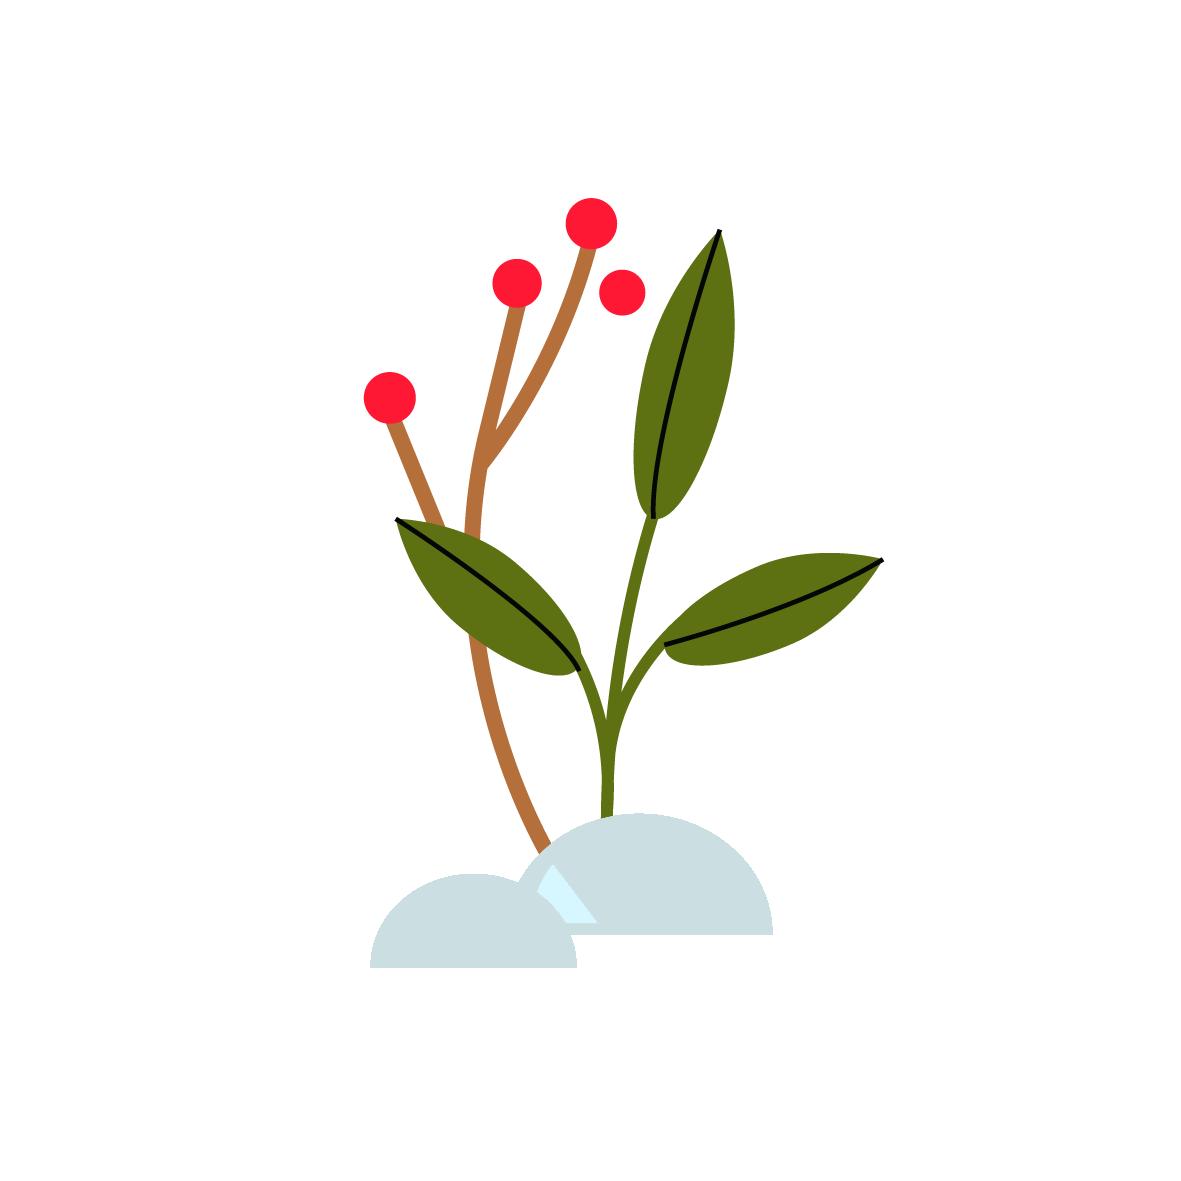 Winter plants - Vector Illustration © Emeline Barrea, All rights reserved